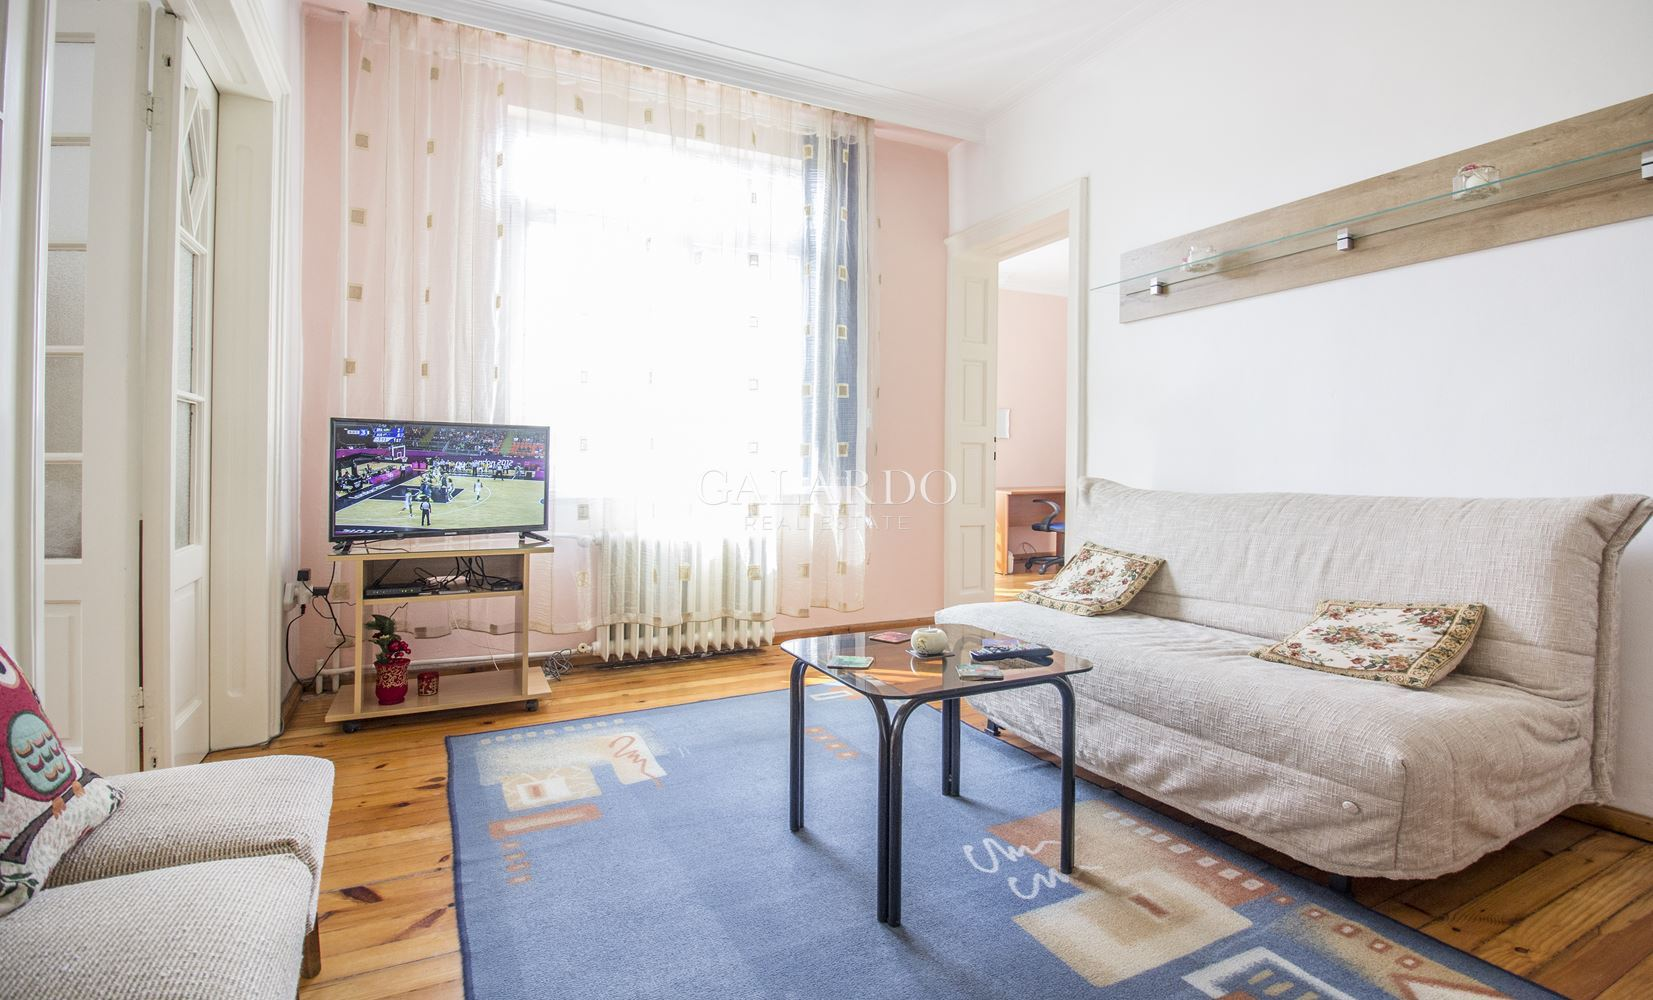 Тристаен апартамент в района на НДК